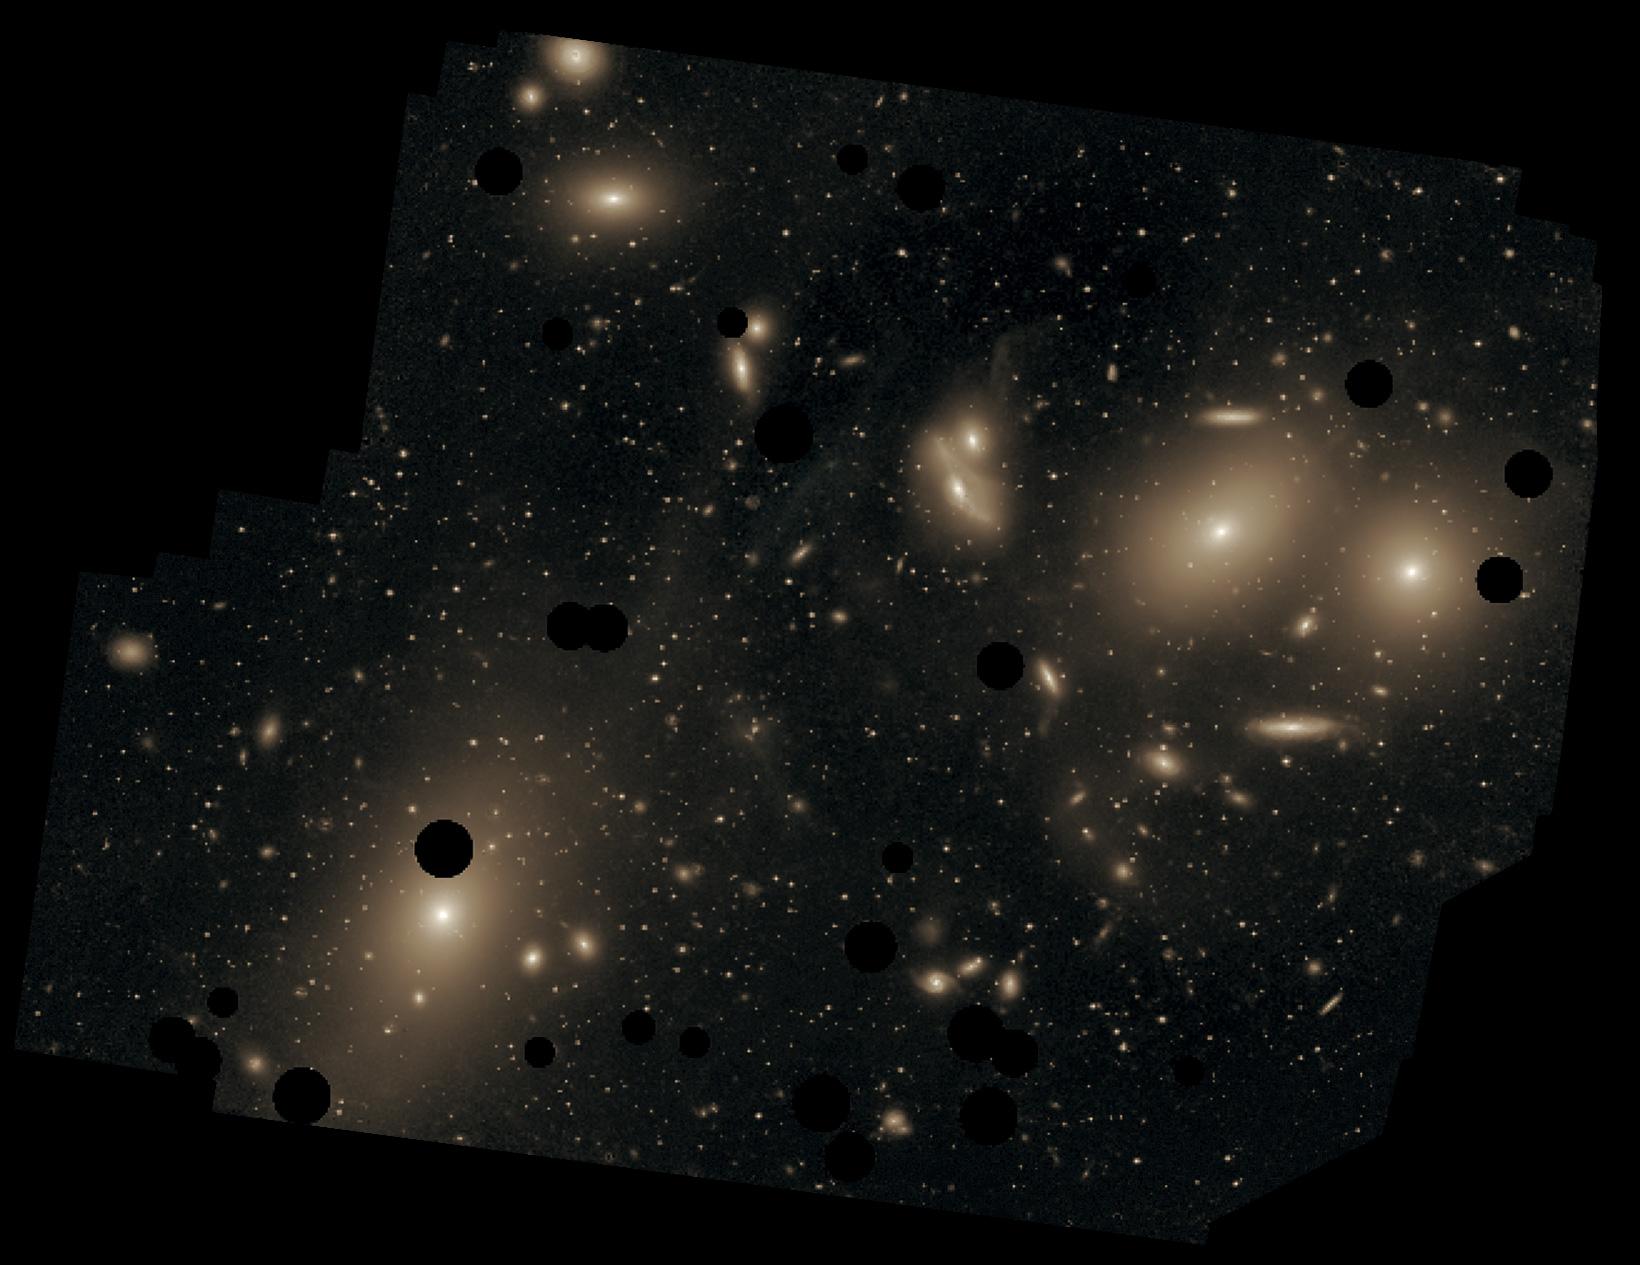 virgo cluster - wikipedia